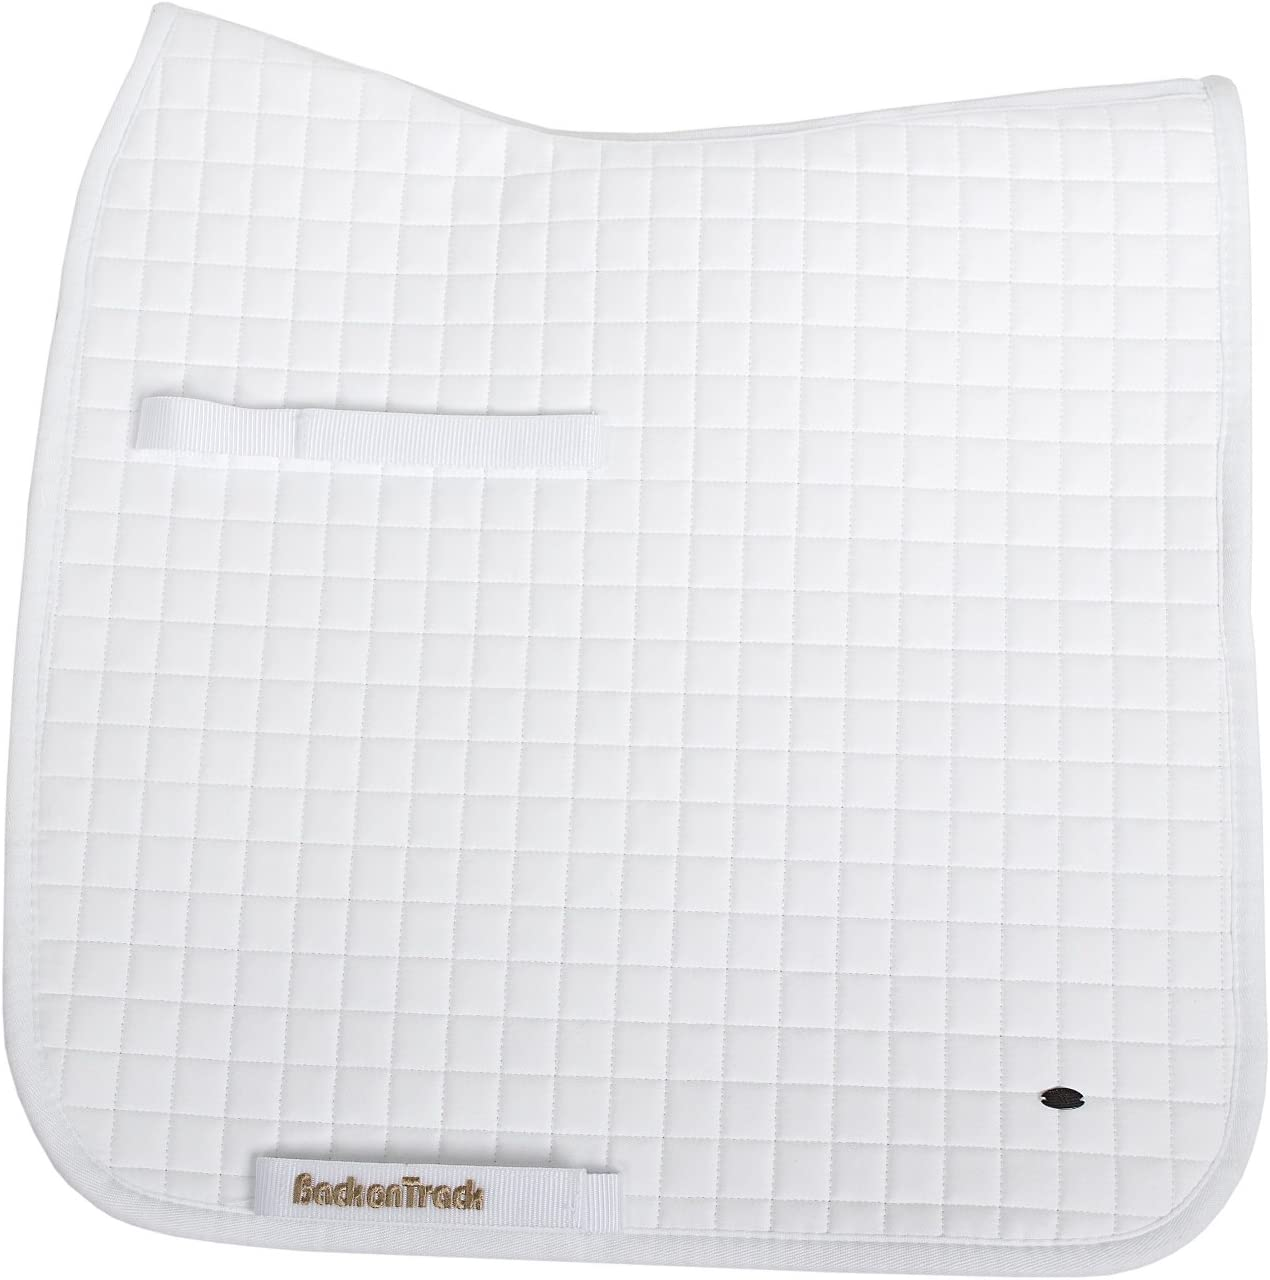 Back on Track Schabracke Dressage welltex ® NO I blanc avec fibres céramiques